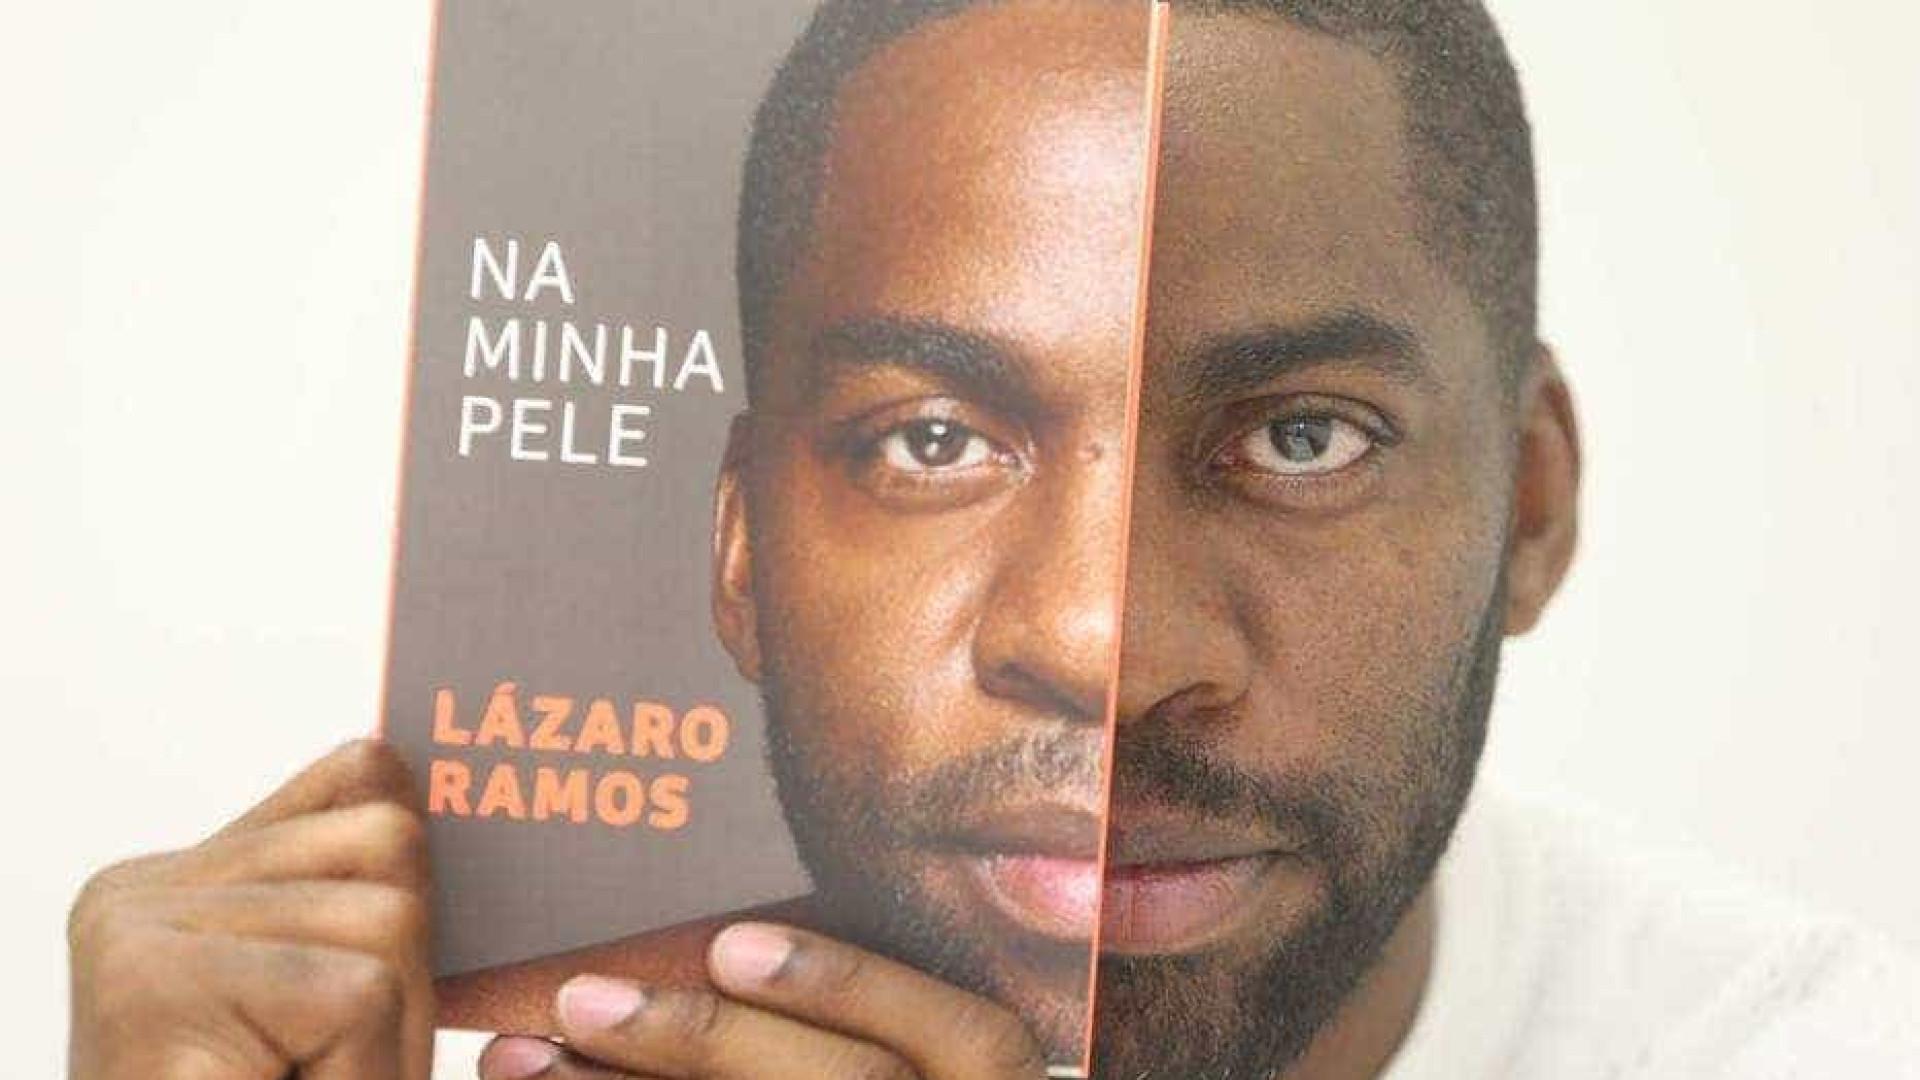 Primeiro livro de Lázaro Ramos entra na lista dos mais vendidos